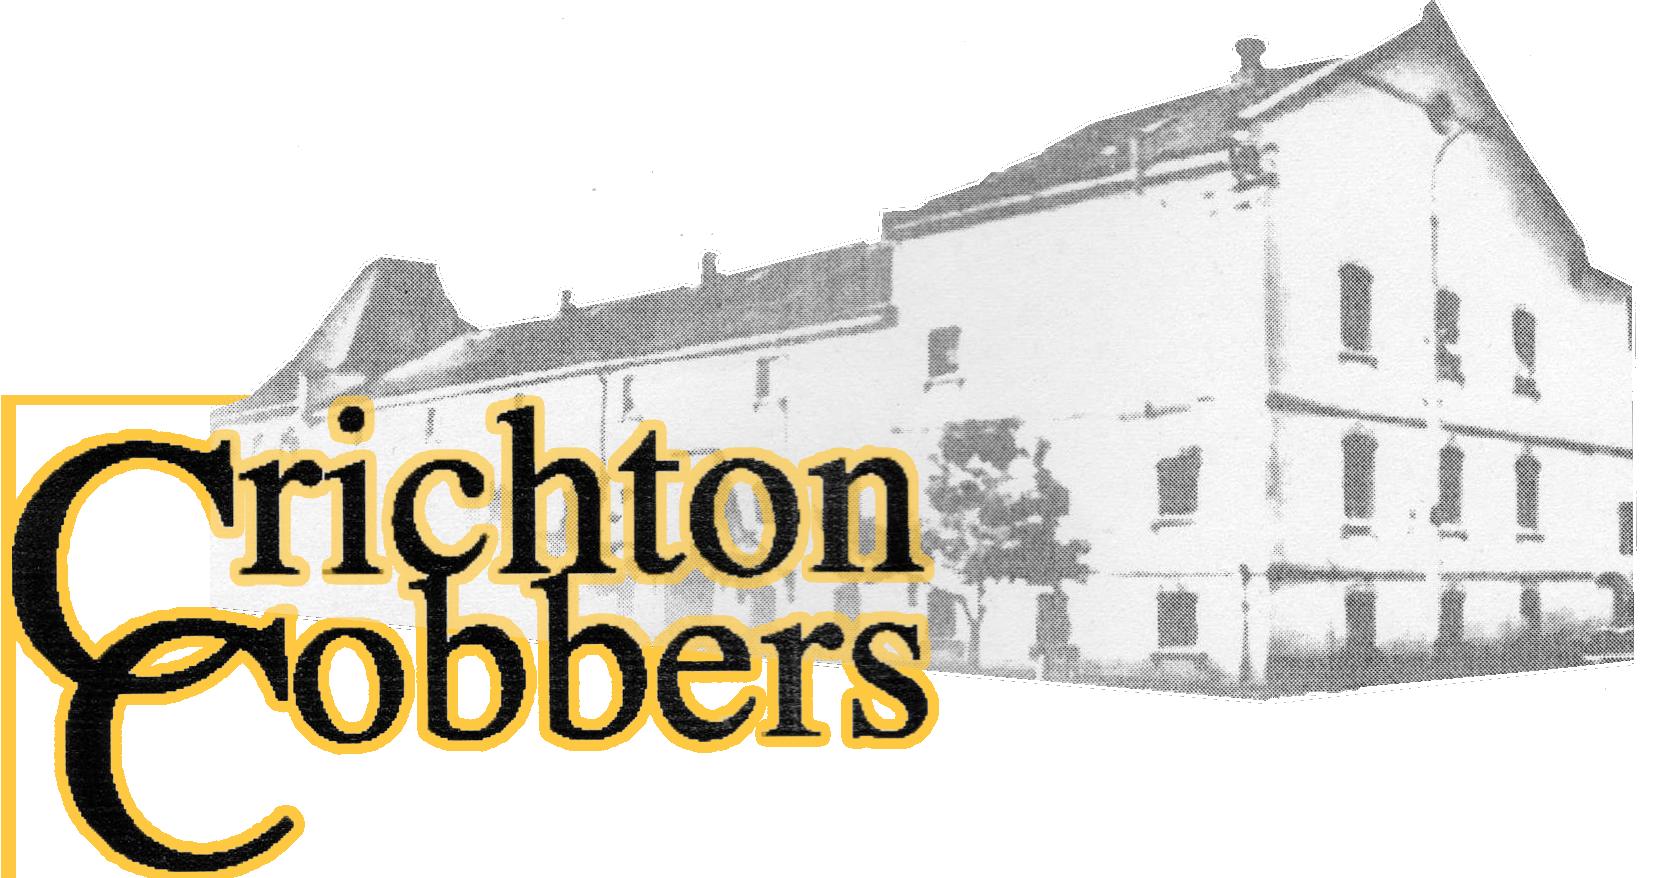 Crichton Cobbers' Scholarship Fund